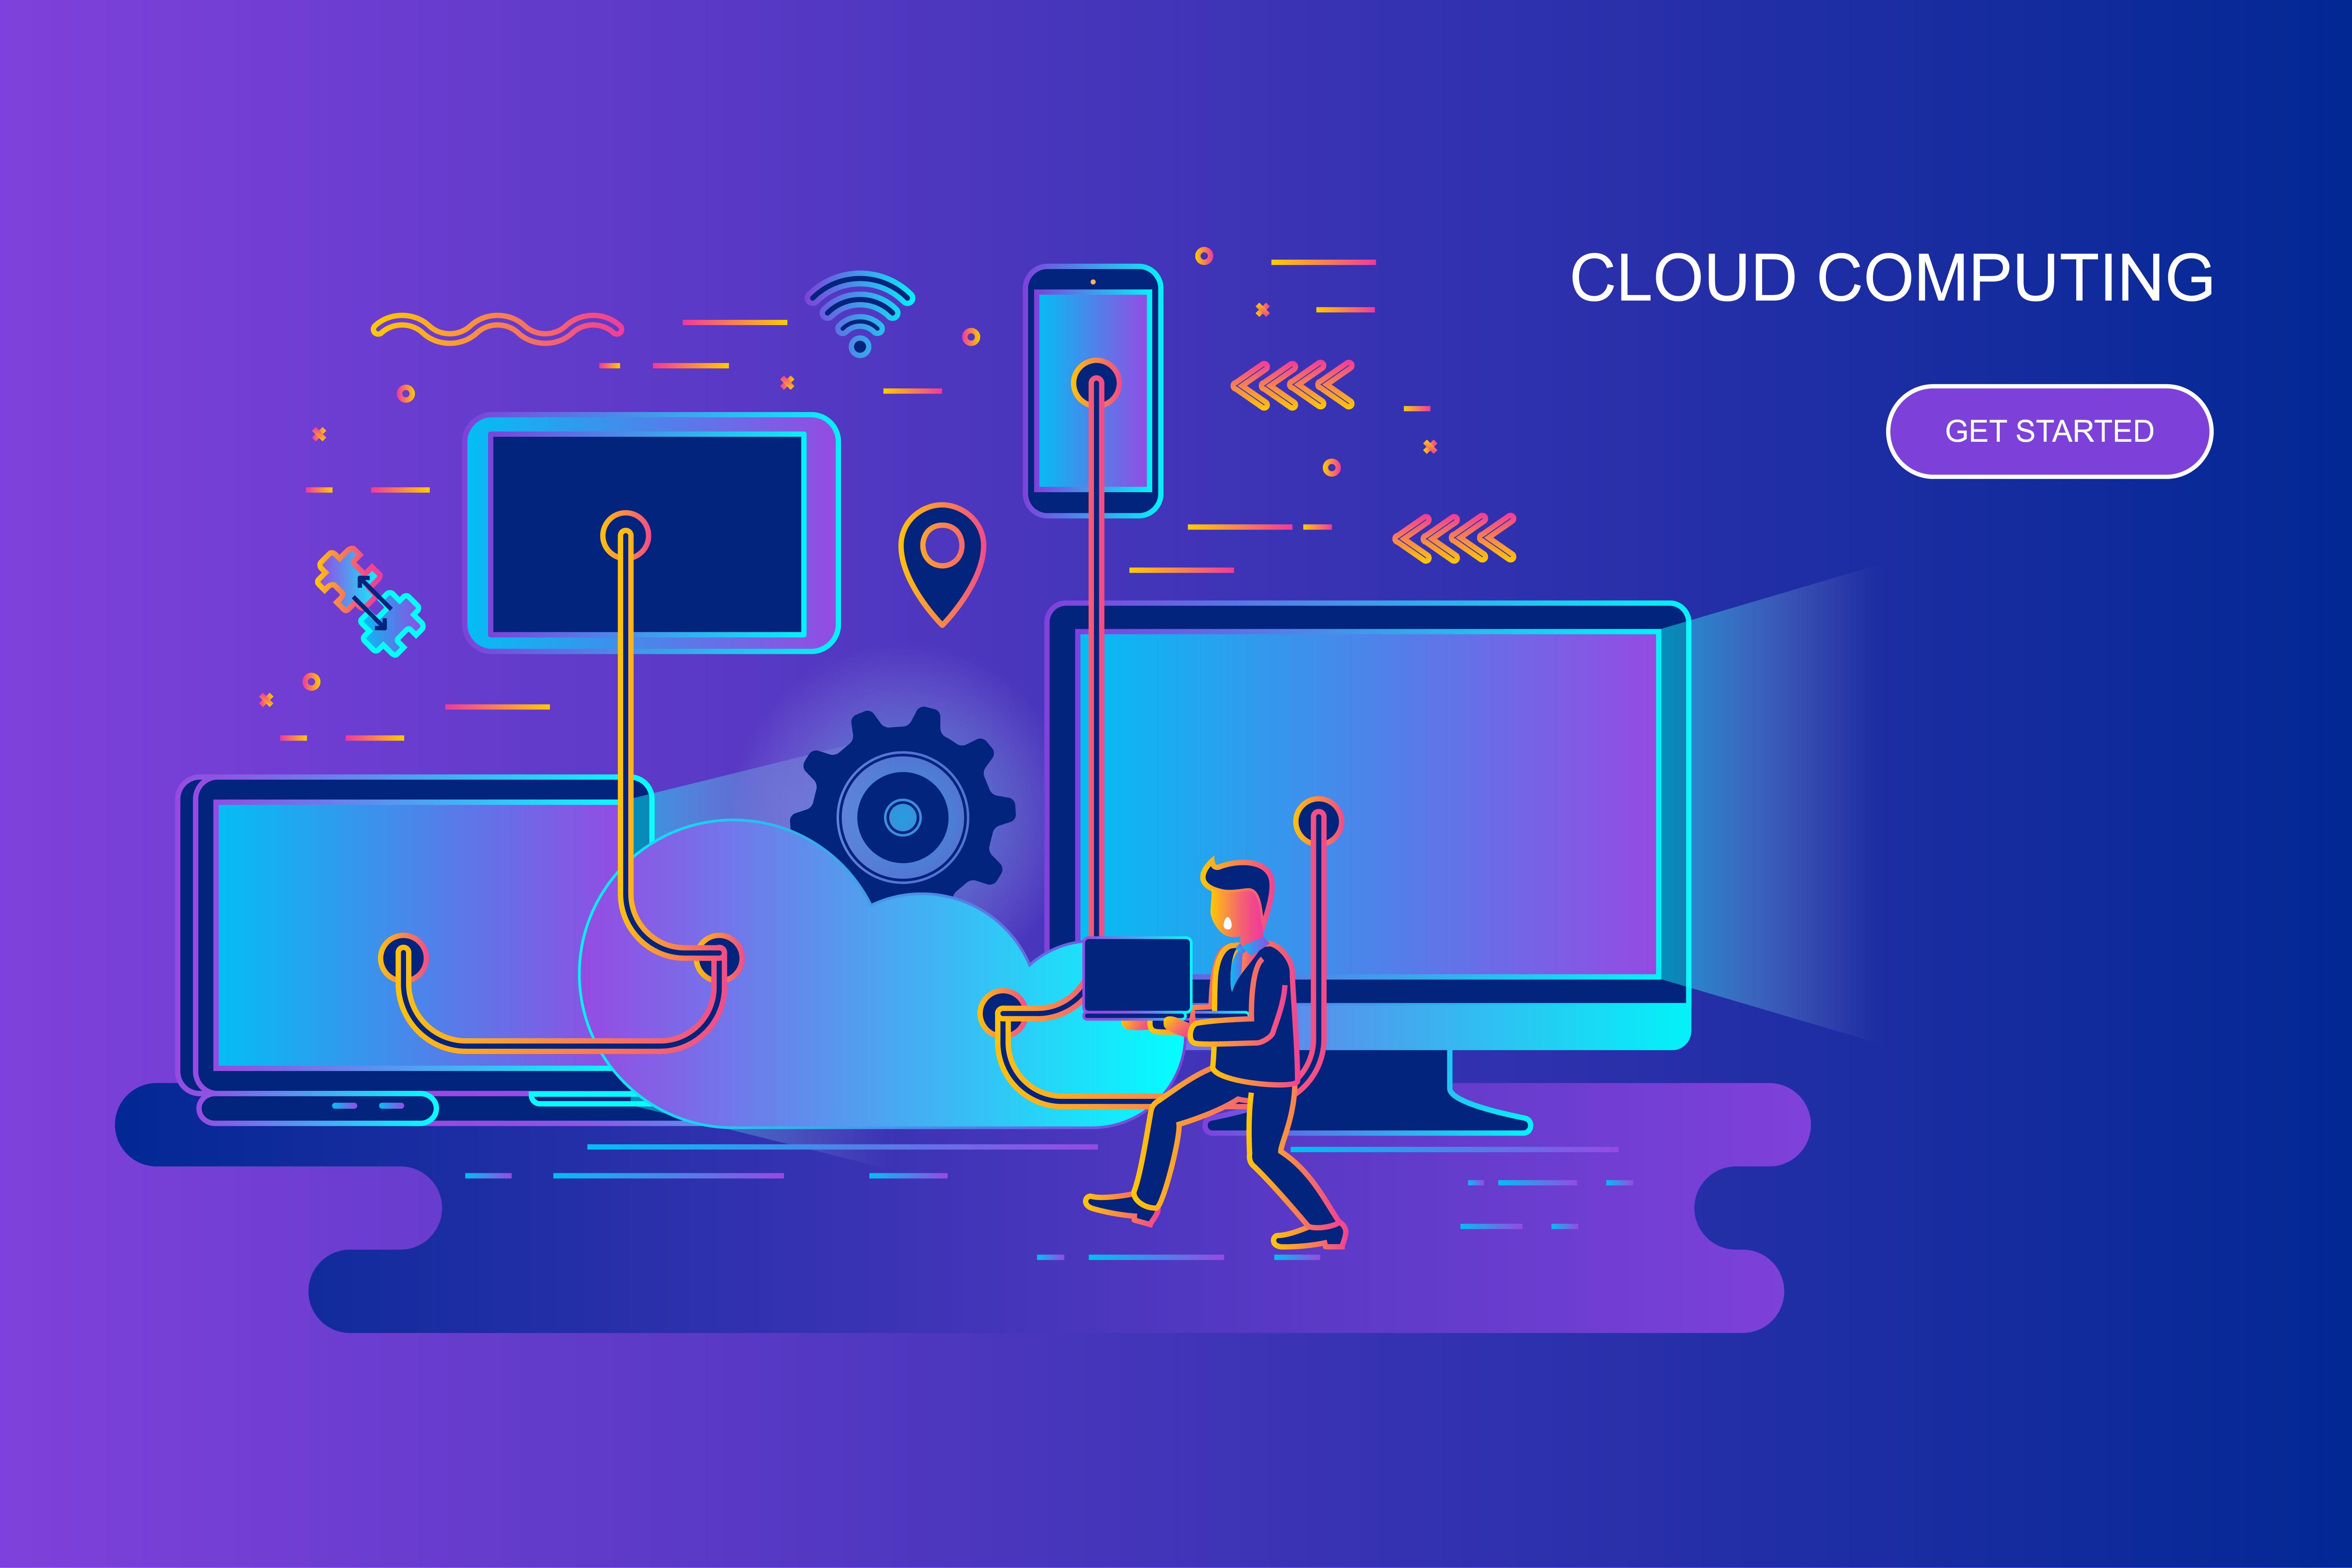 cloud computing documentation free download